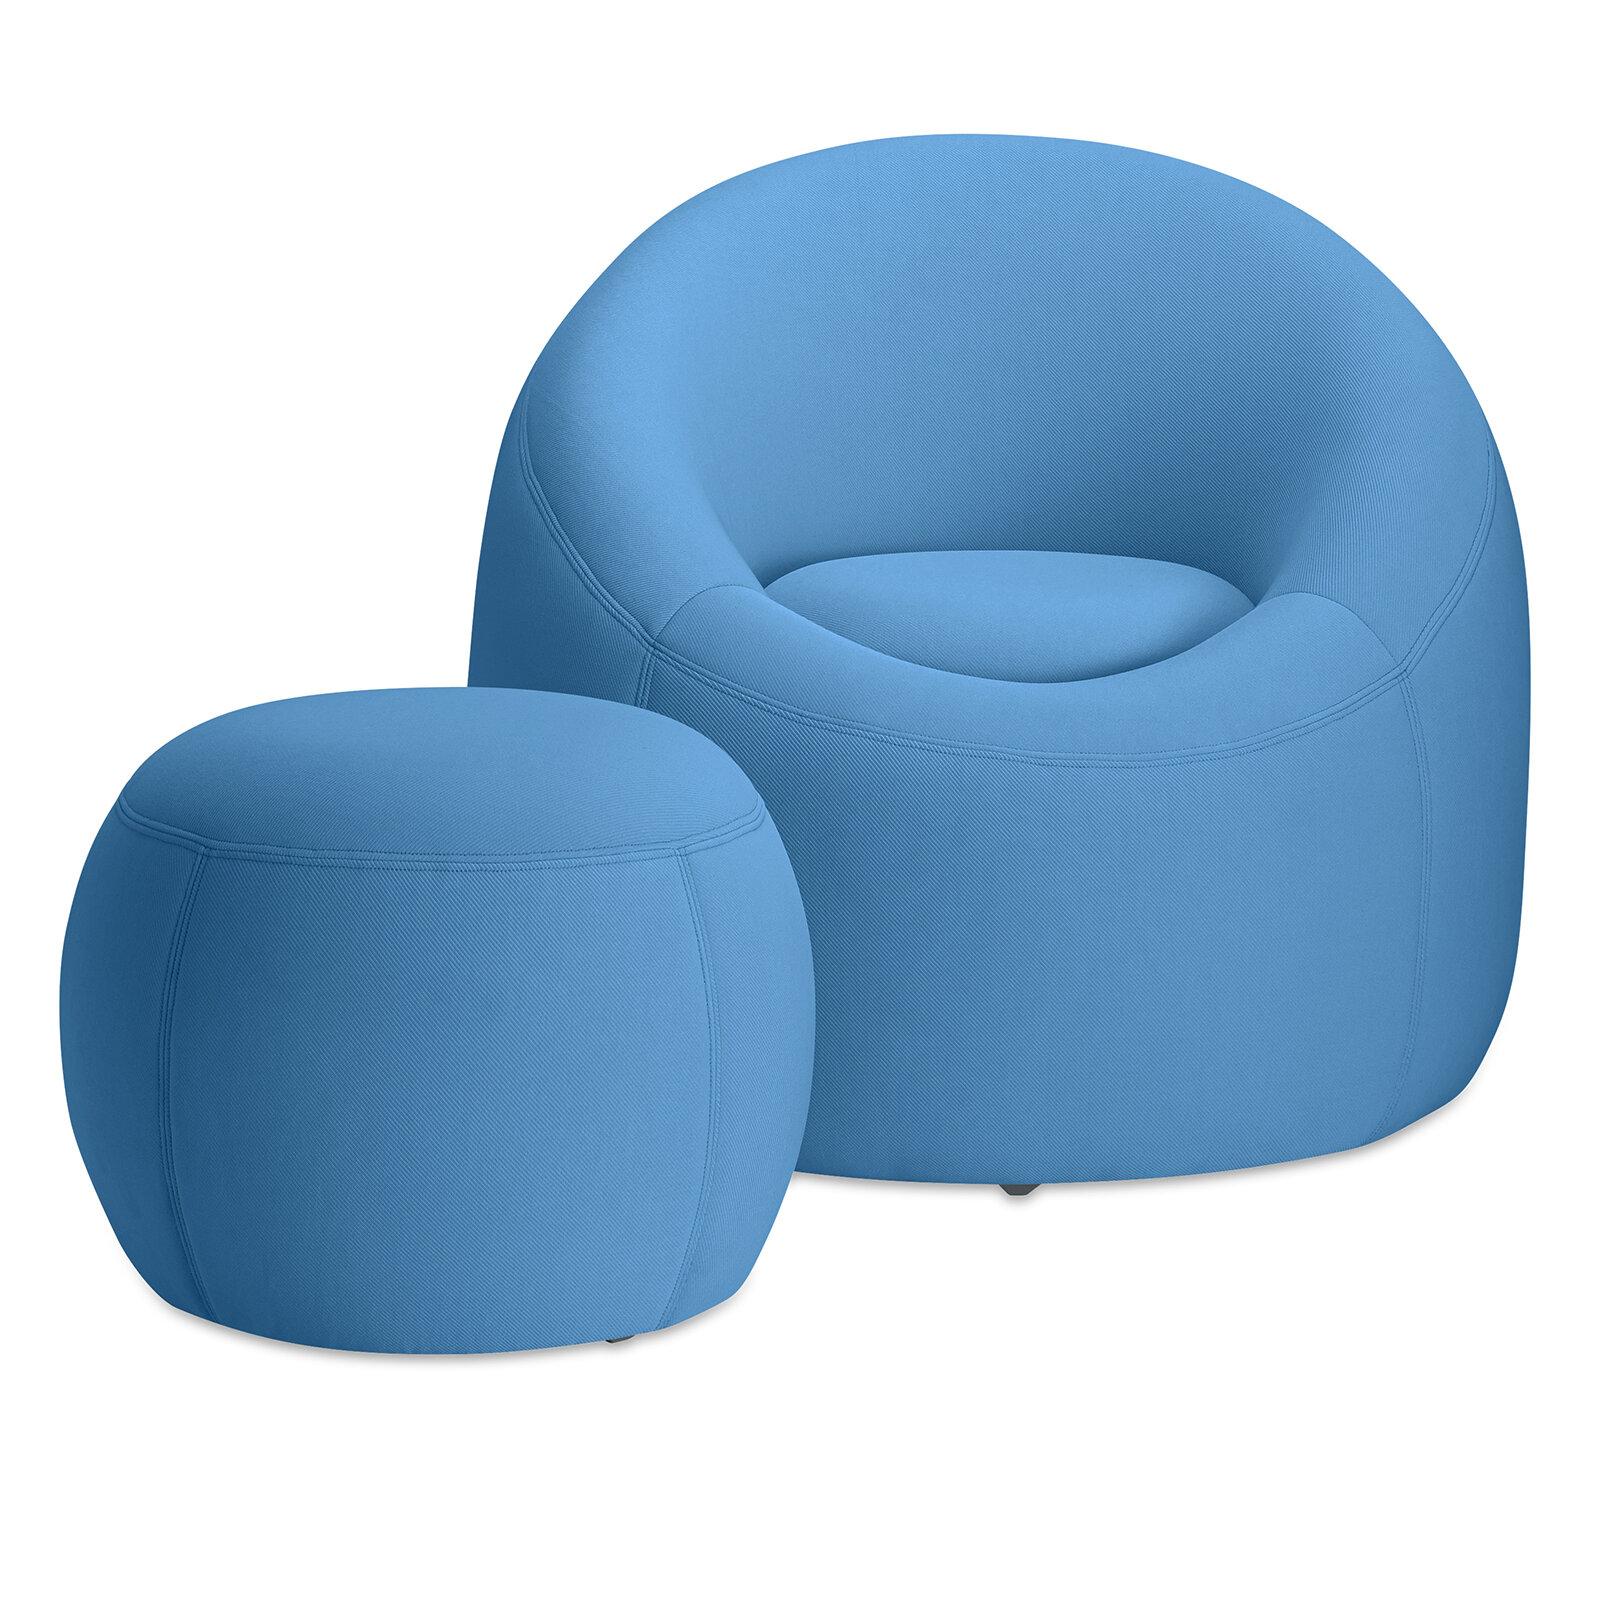 Omo Modern Memory Foam Lounge Chair With Ottoman